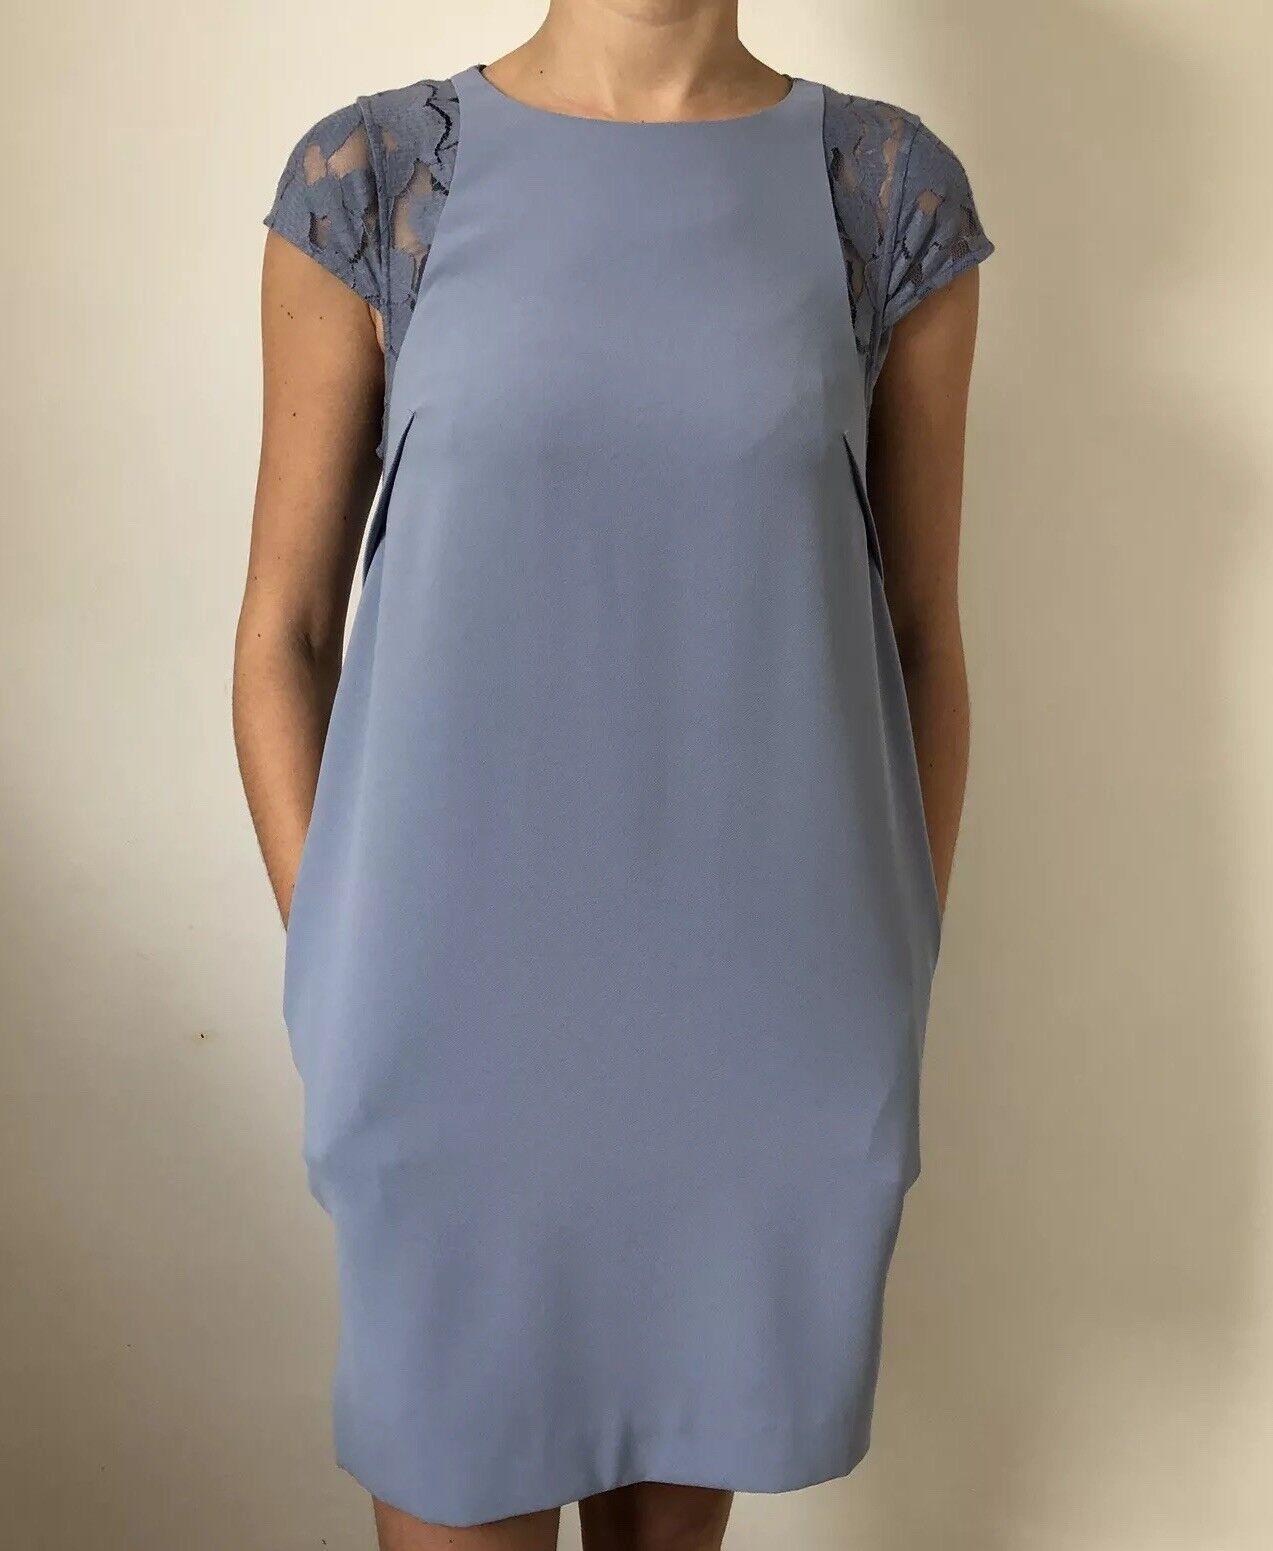 damen Reiss Dress Größe 12 A Line Blau Lace Knee Length Line Sleeveless Round Nec